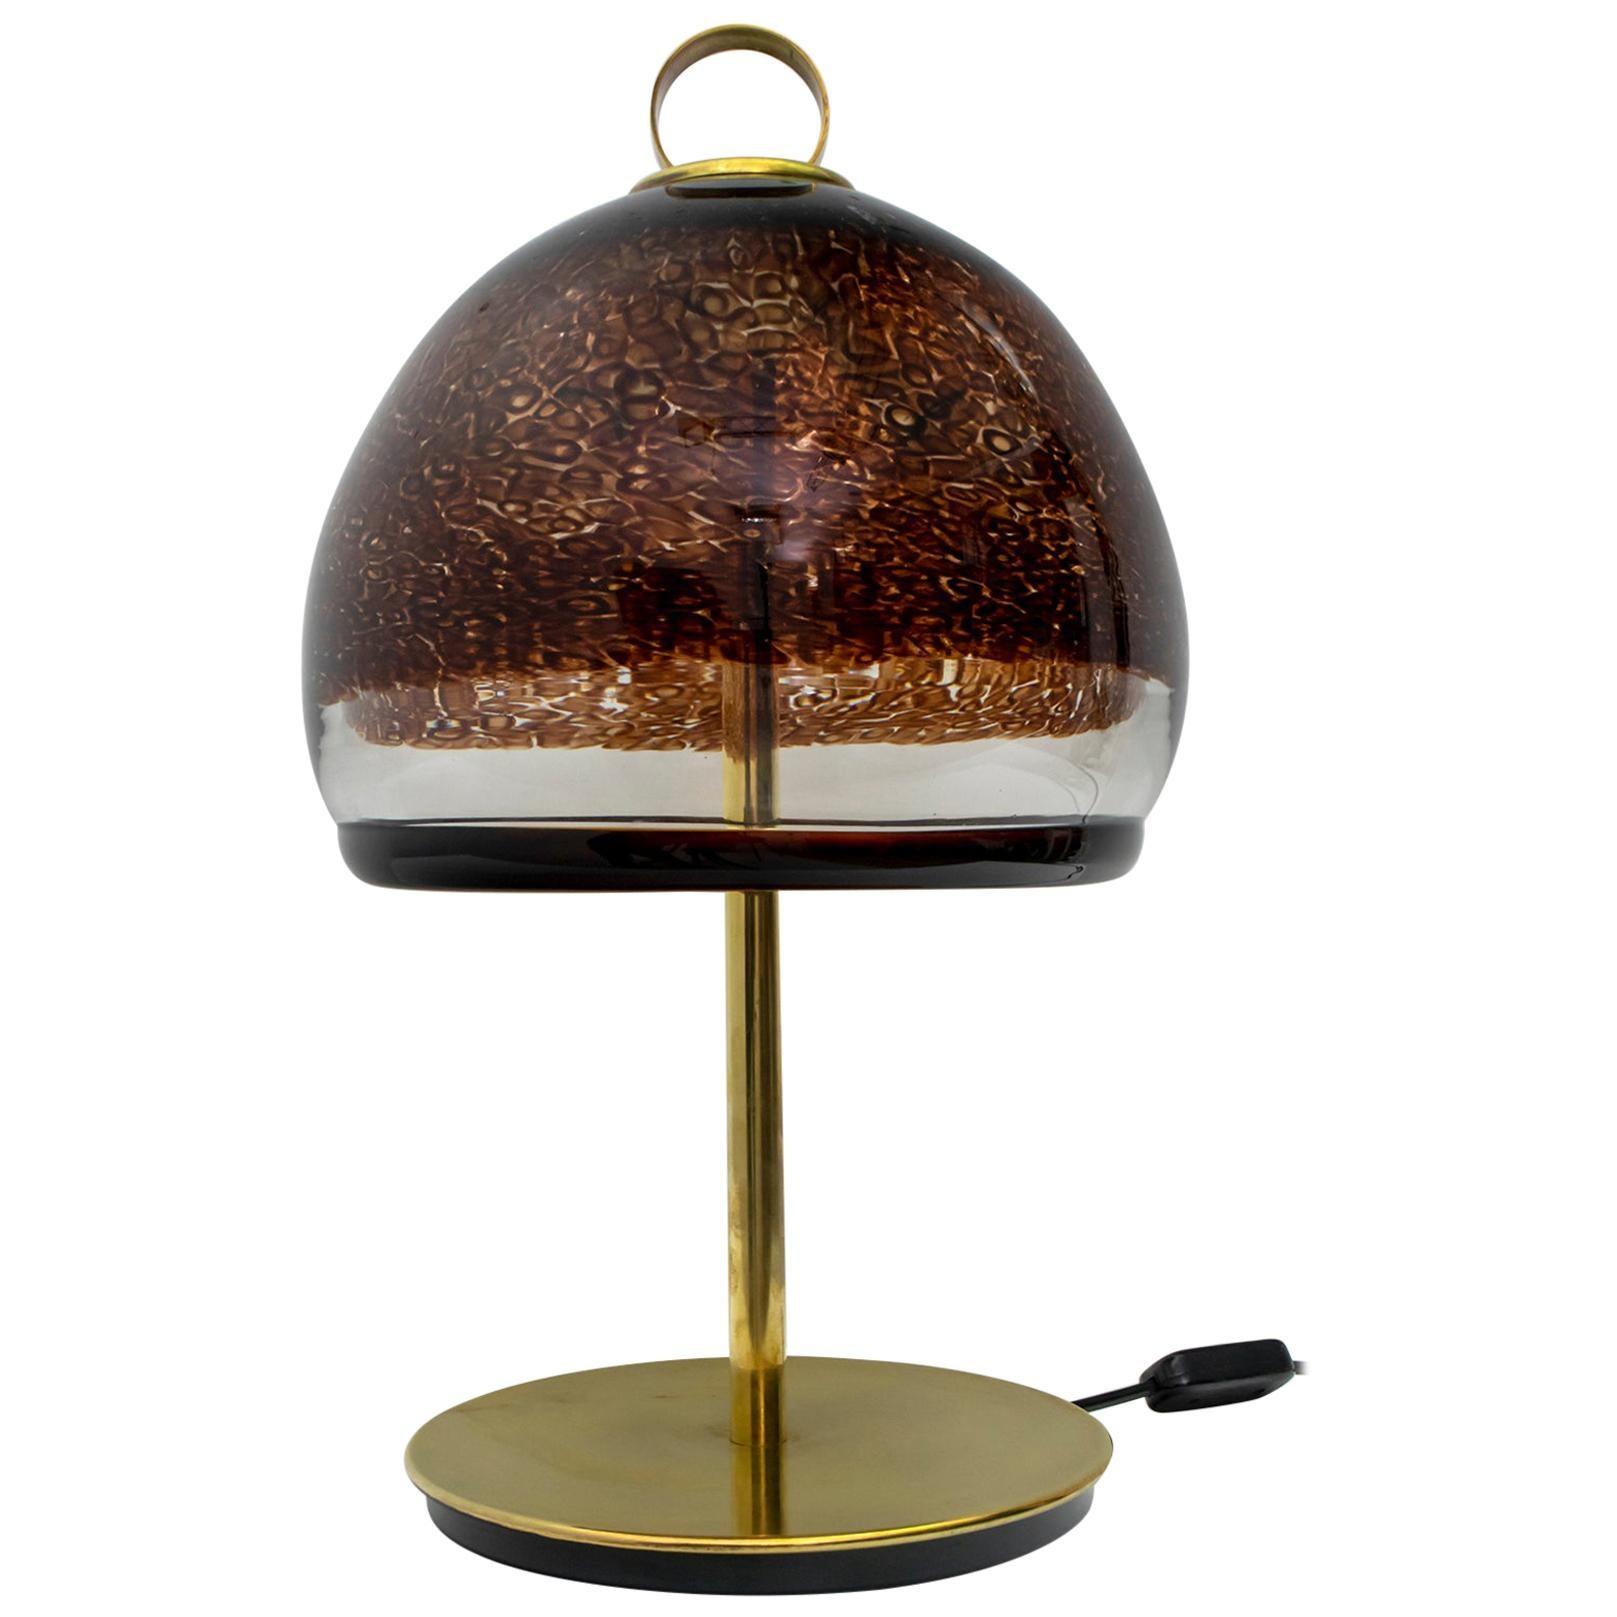 Leucos Mid-Century Modern Italian Murano Glass and Brass Table Lamp, 1970s